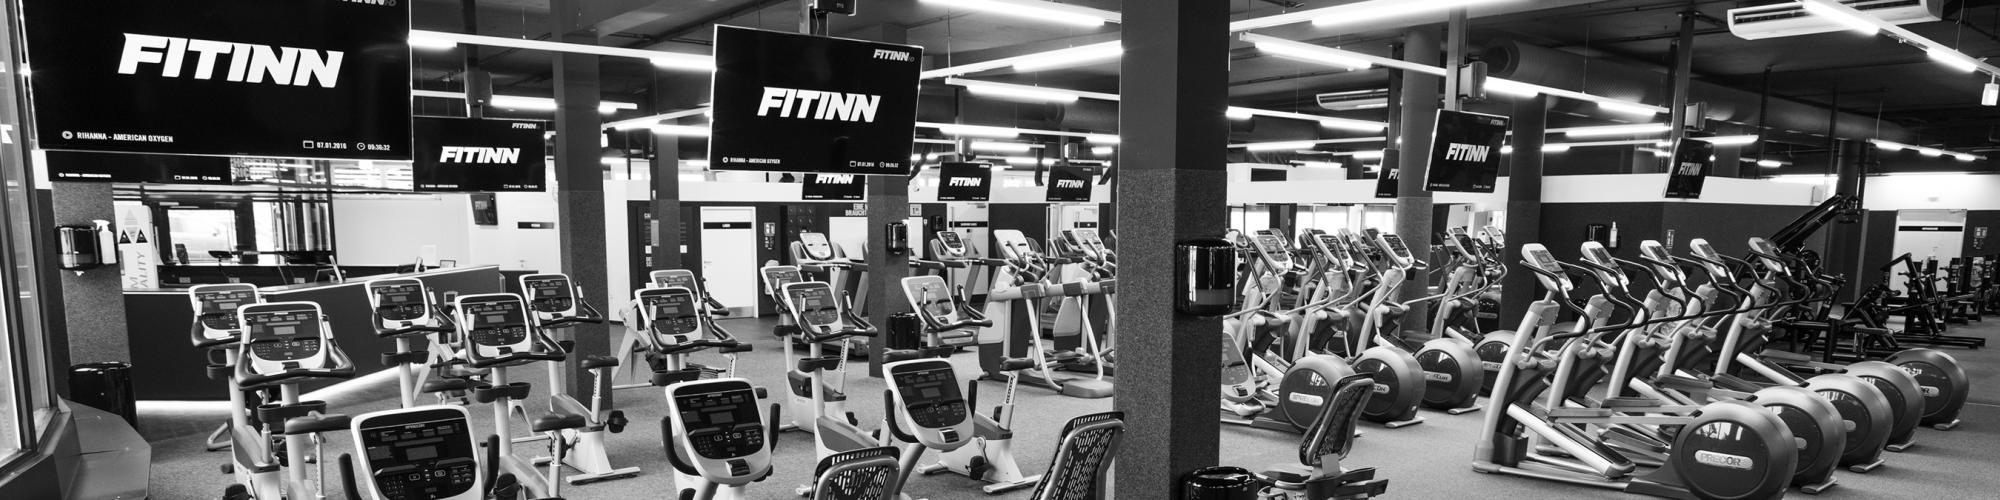 FITINN Sportstudios